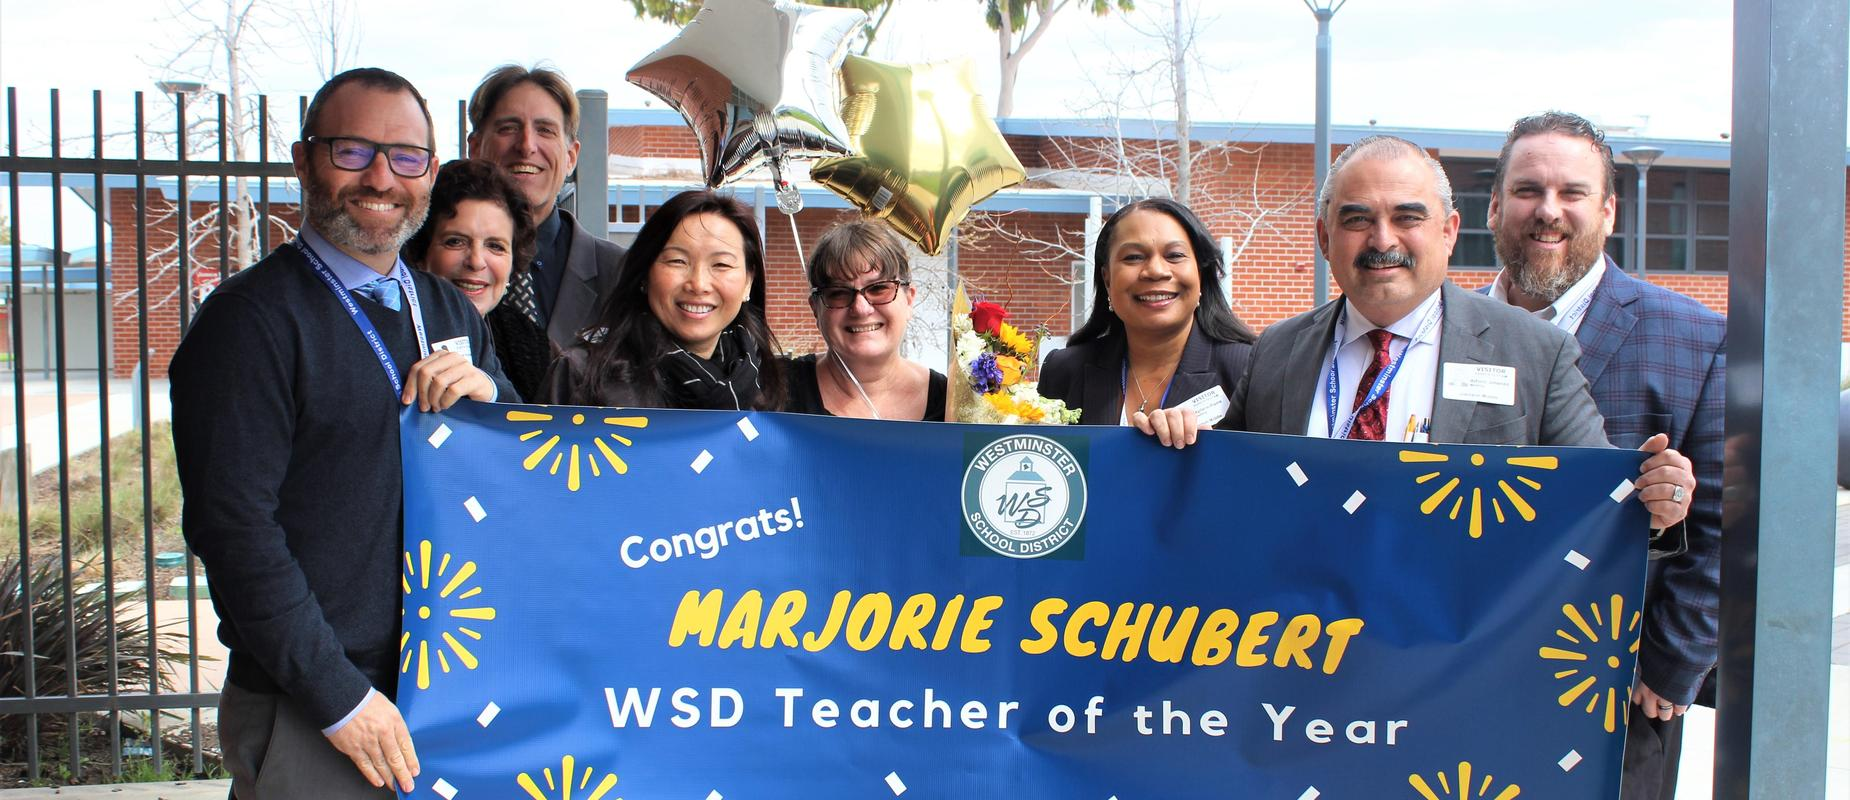 WSD Teacher of the Year